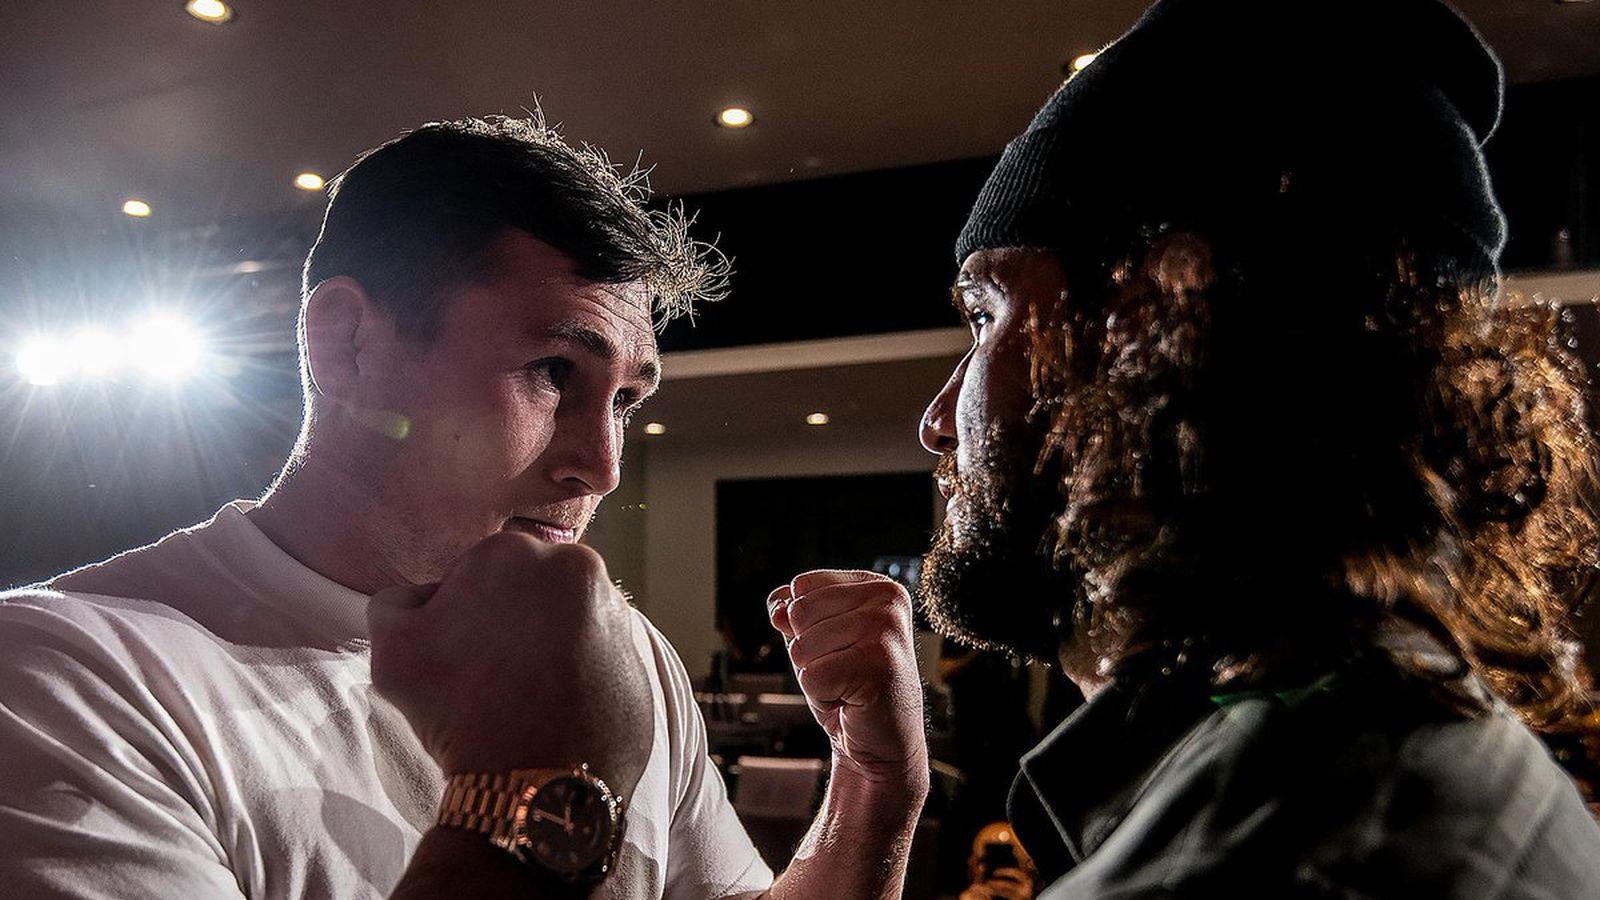 Face off! Watch Darren Till staredown Jorge Masvidal at UFC London press conference